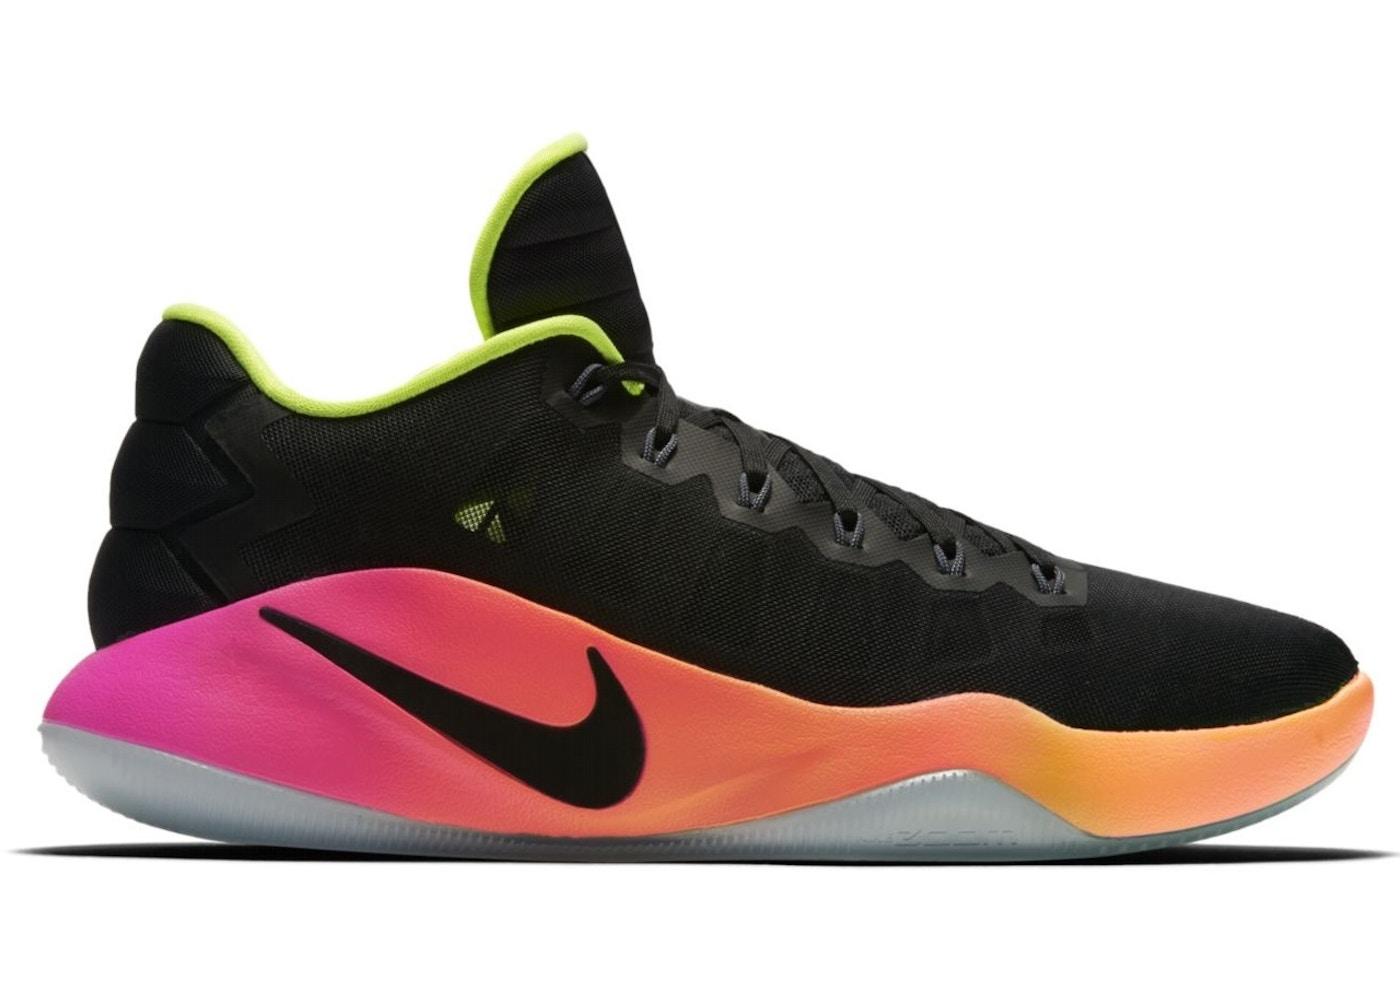 best service ae41d 77480 Nike Basketball Hyperdunk Shoes - Release Date